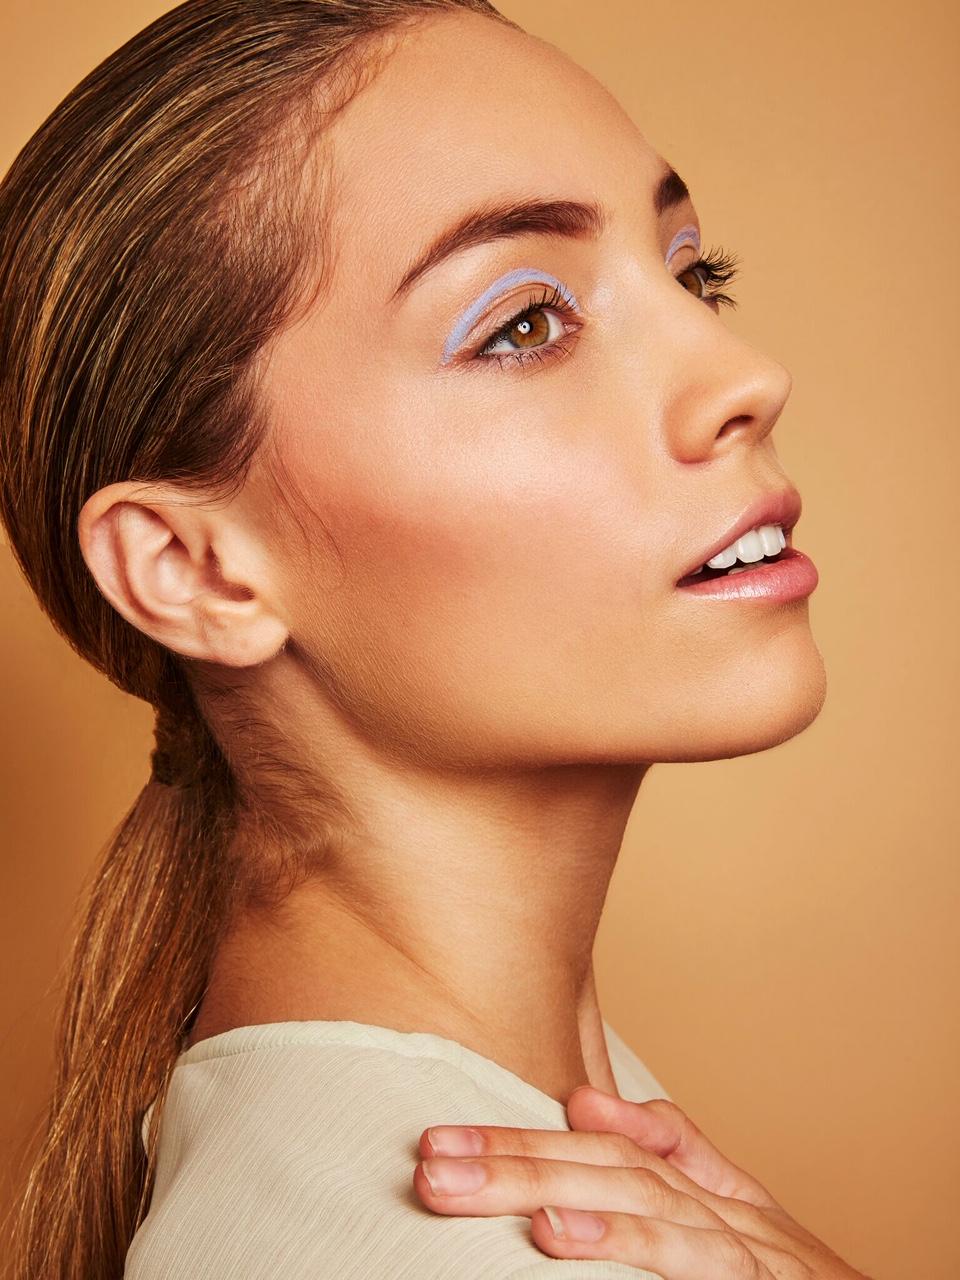 Photographer: Sergio Nechoechea | Model: Agustina Tisler | Hair: Brianna Barela